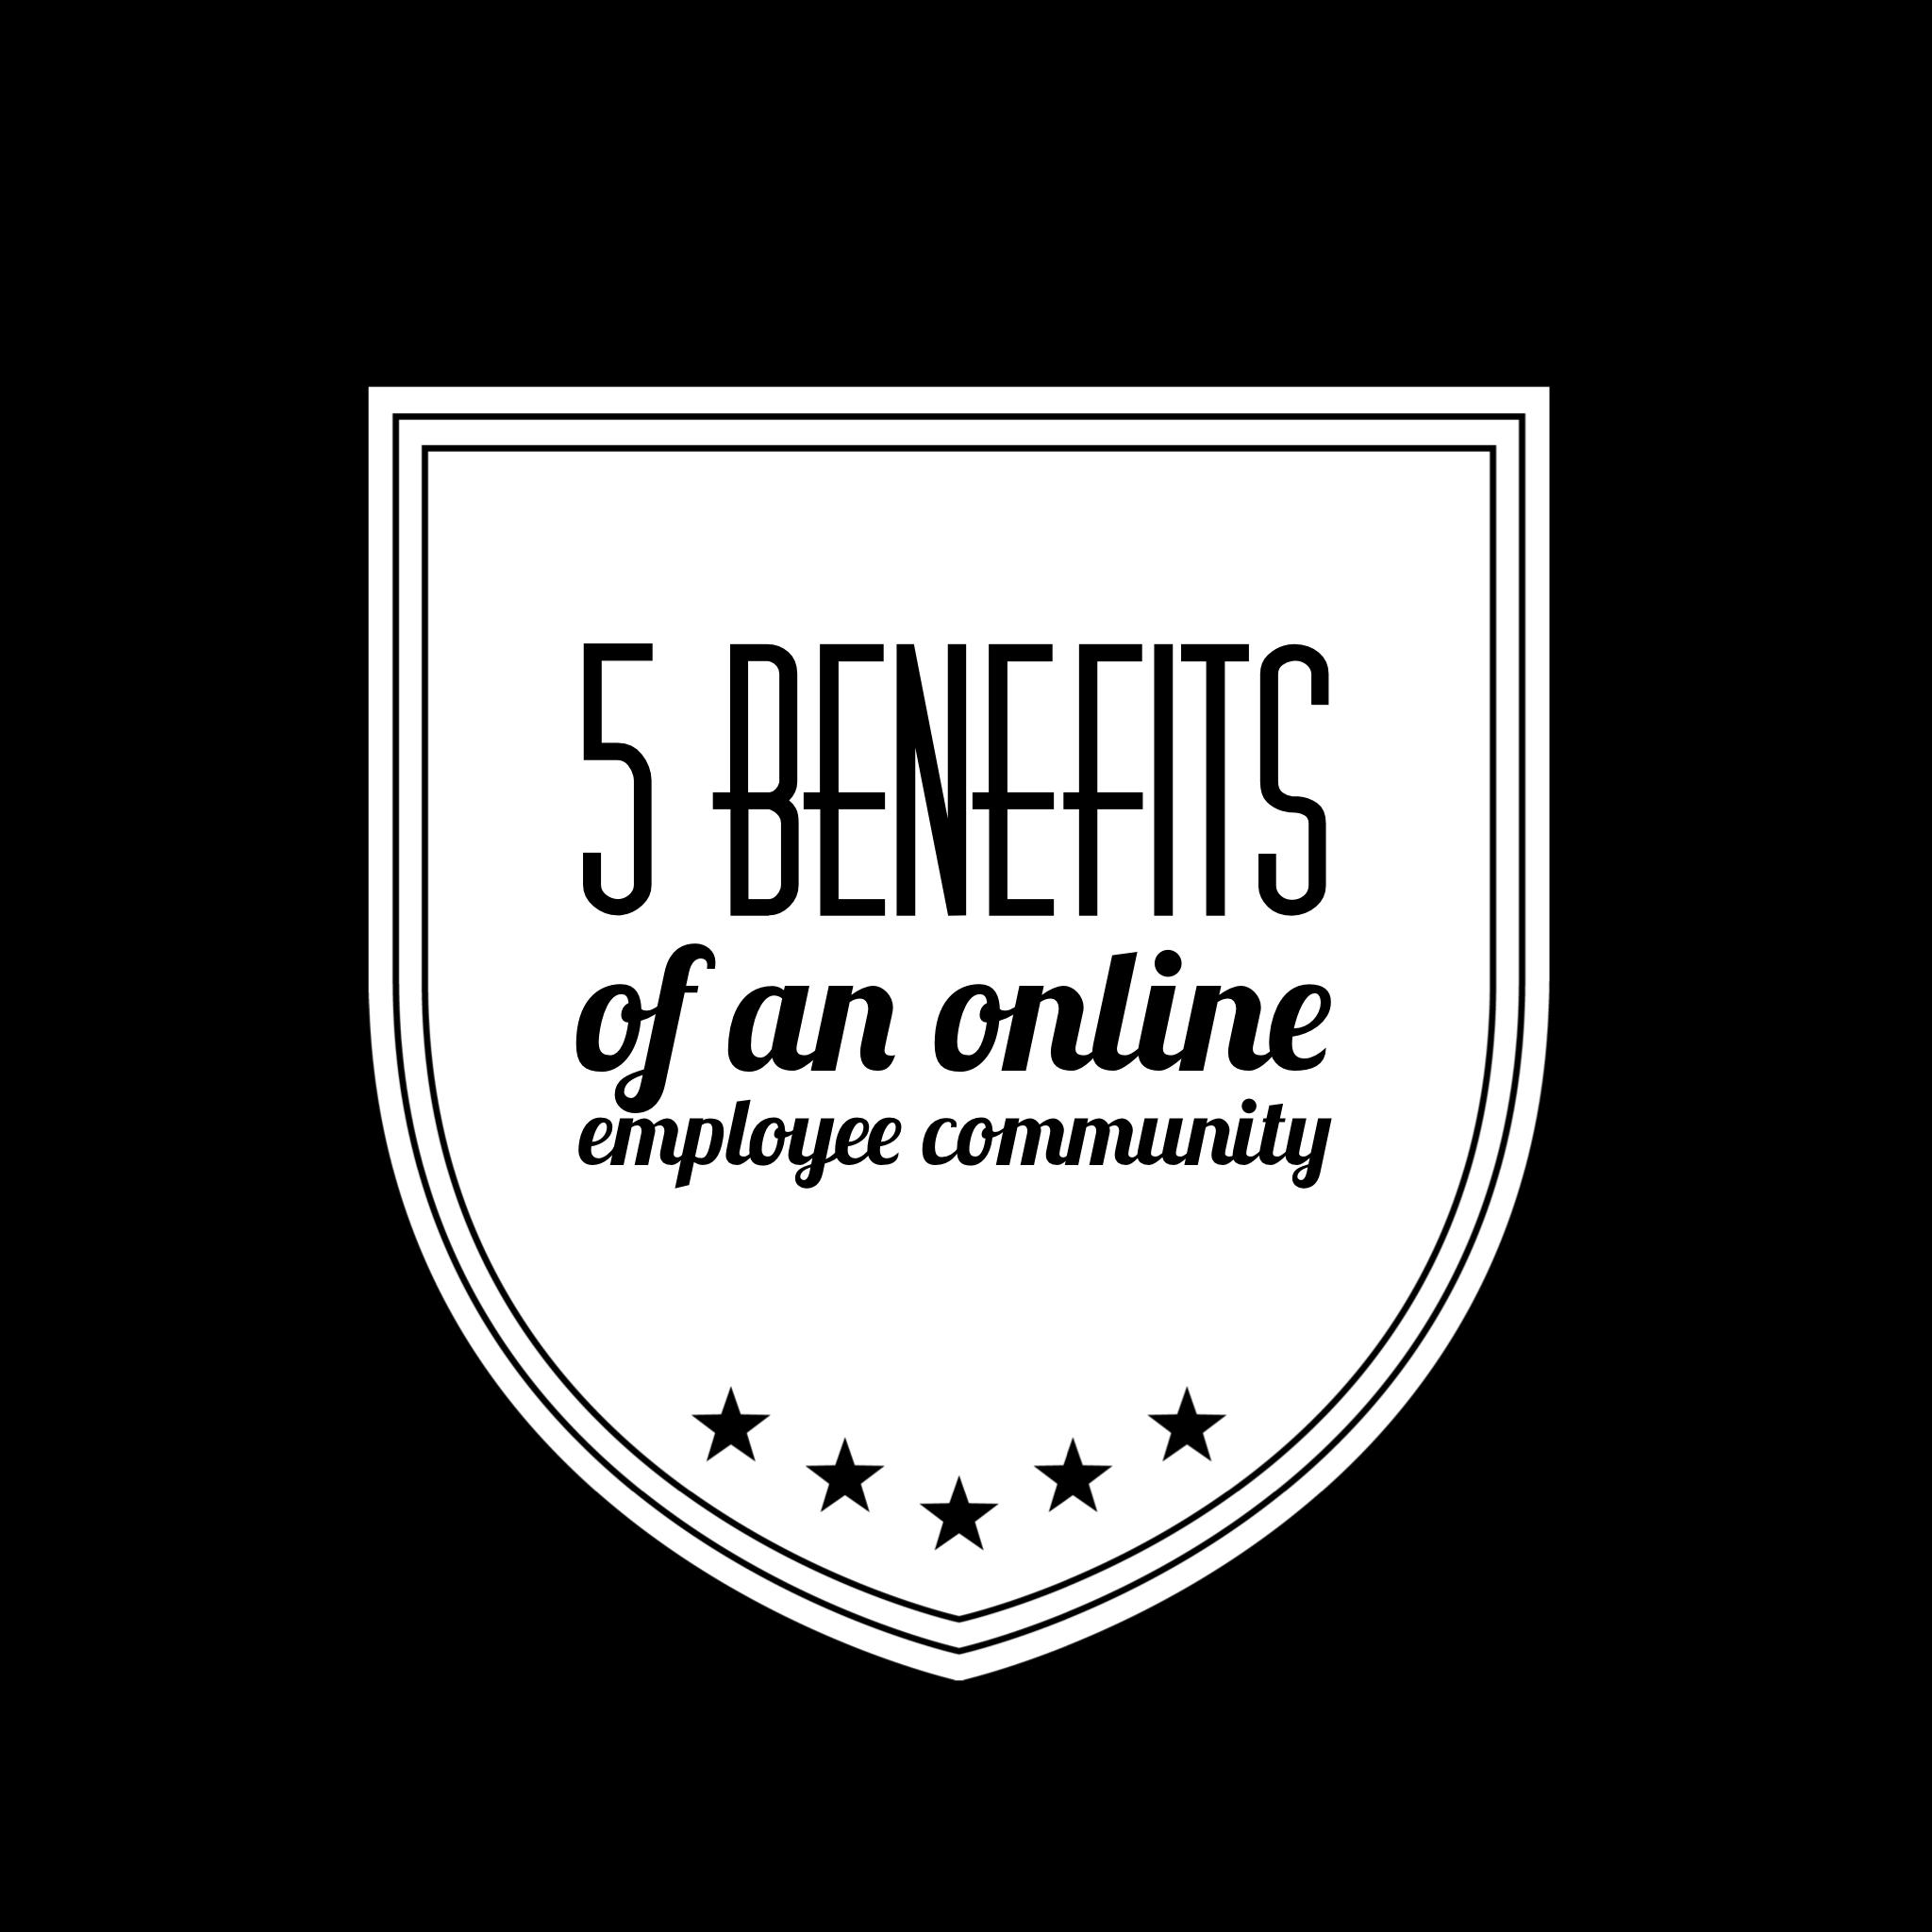 5 Benefits of an Online Employee Community